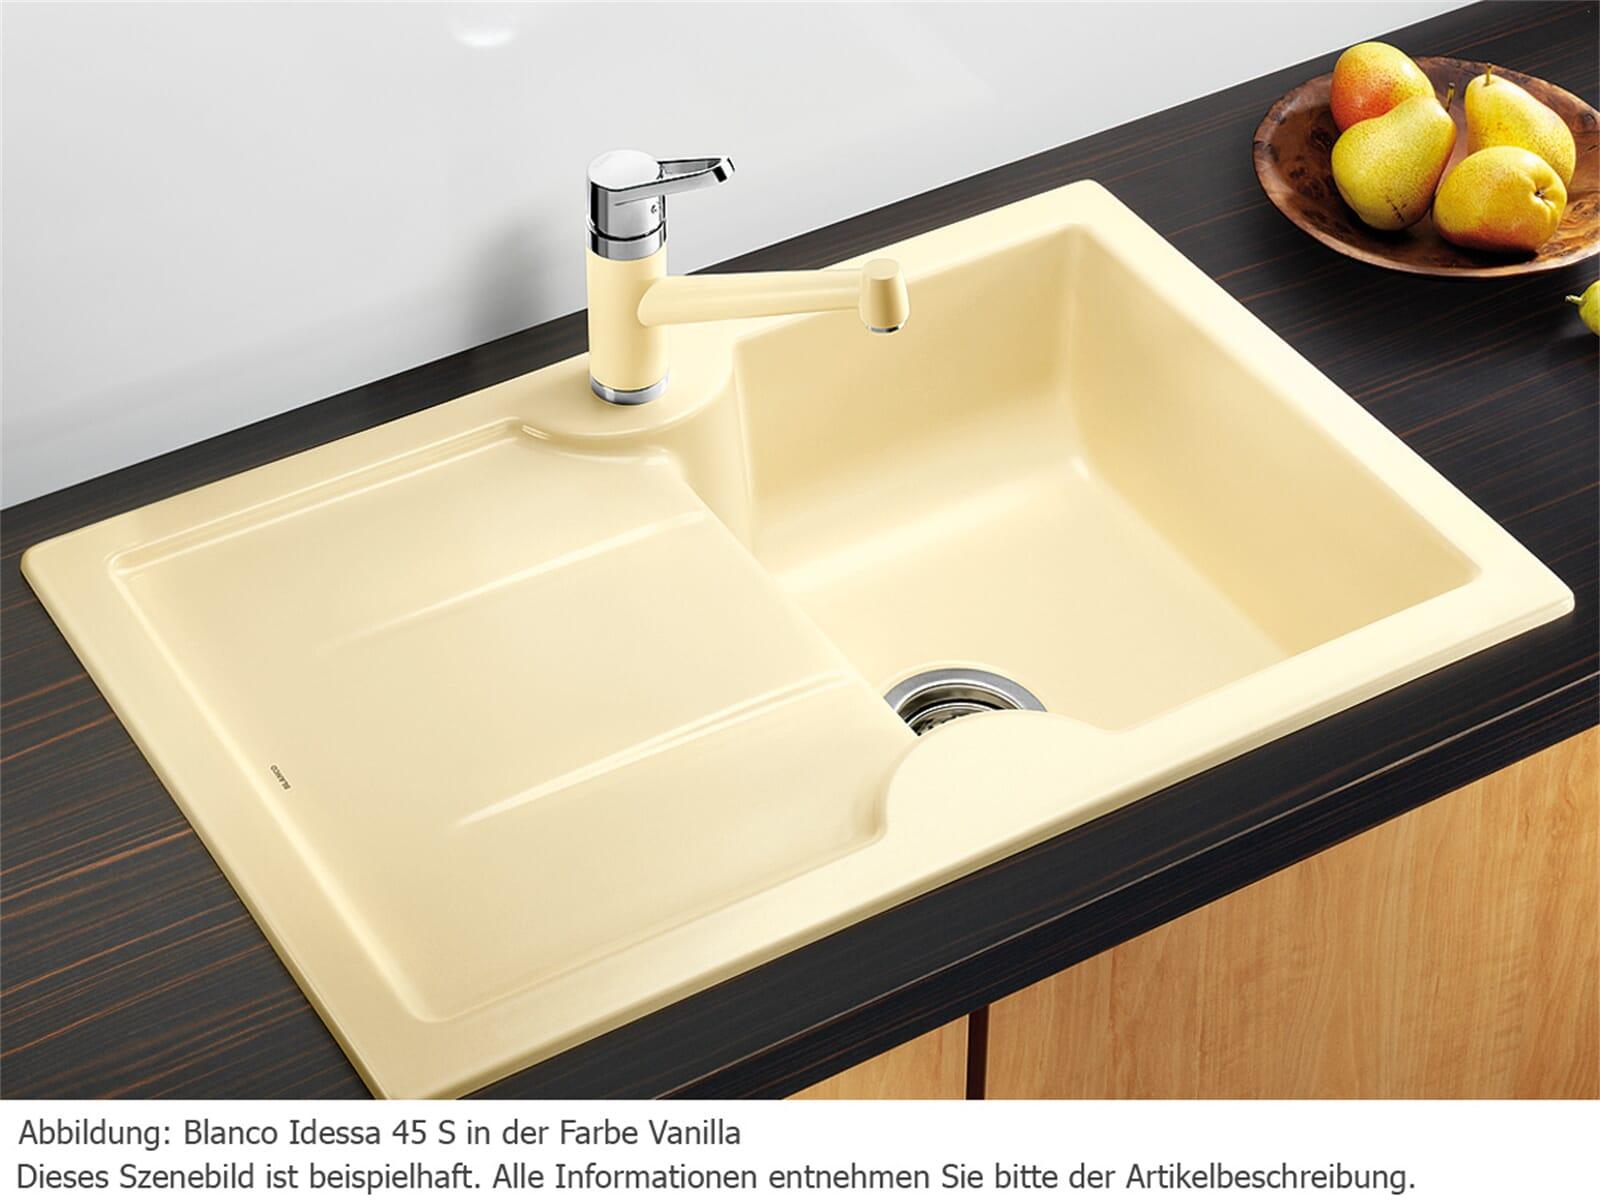 blanco idessa 45 s basalt keramik sp le f r 284 90 eur. Black Bedroom Furniture Sets. Home Design Ideas